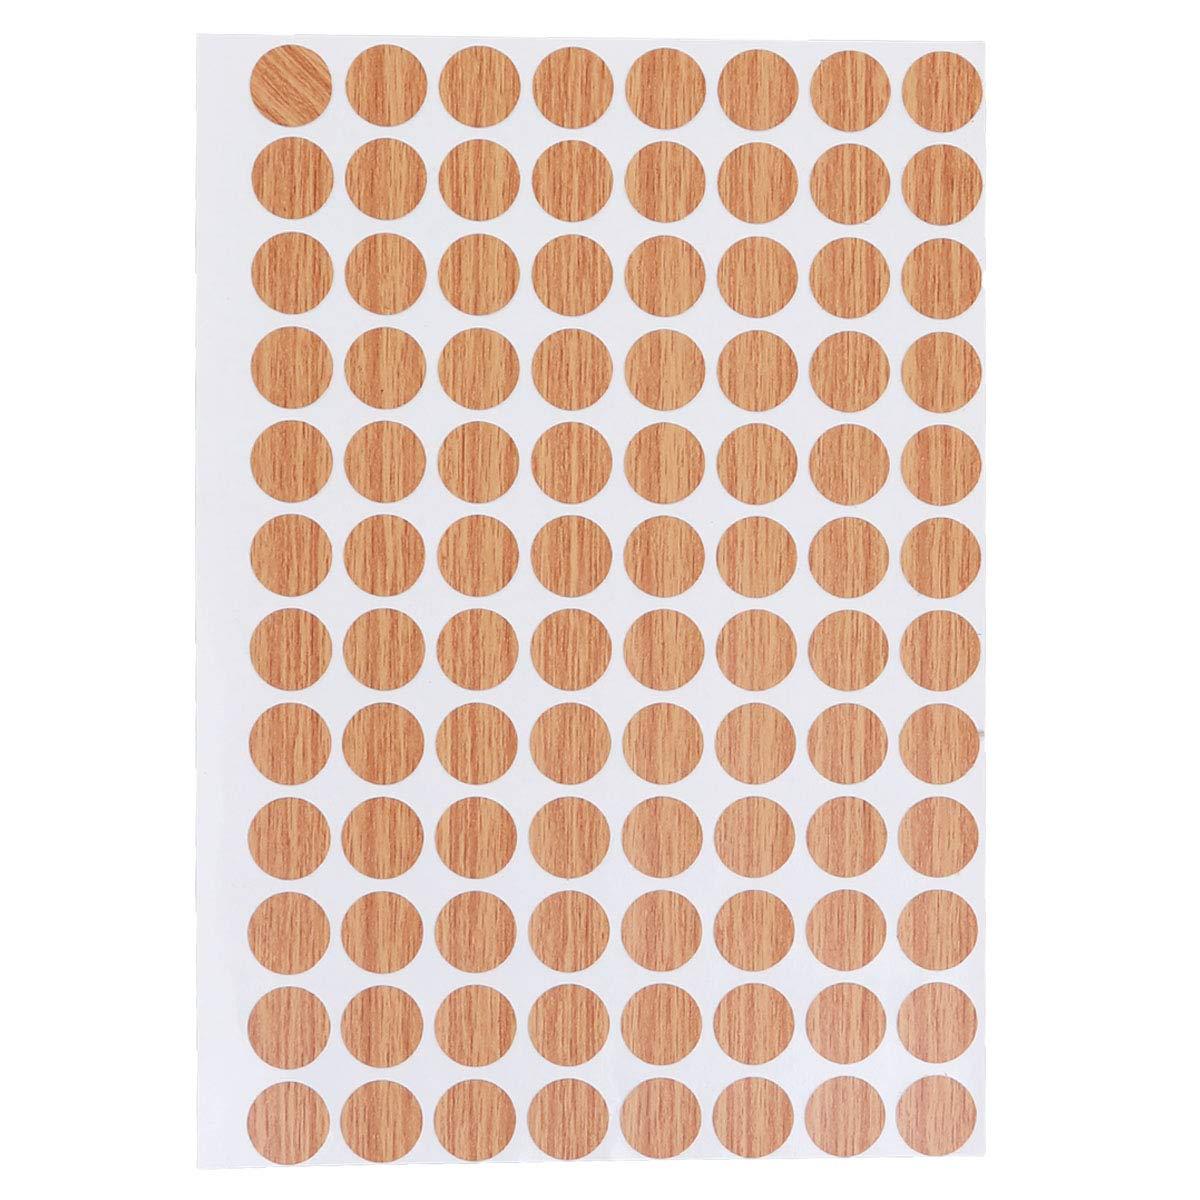 Vosarea Waterproof Screw Hole Covers Non Slip Decorative Stickers 15mm 96pcs/Sheet (Light Brown)